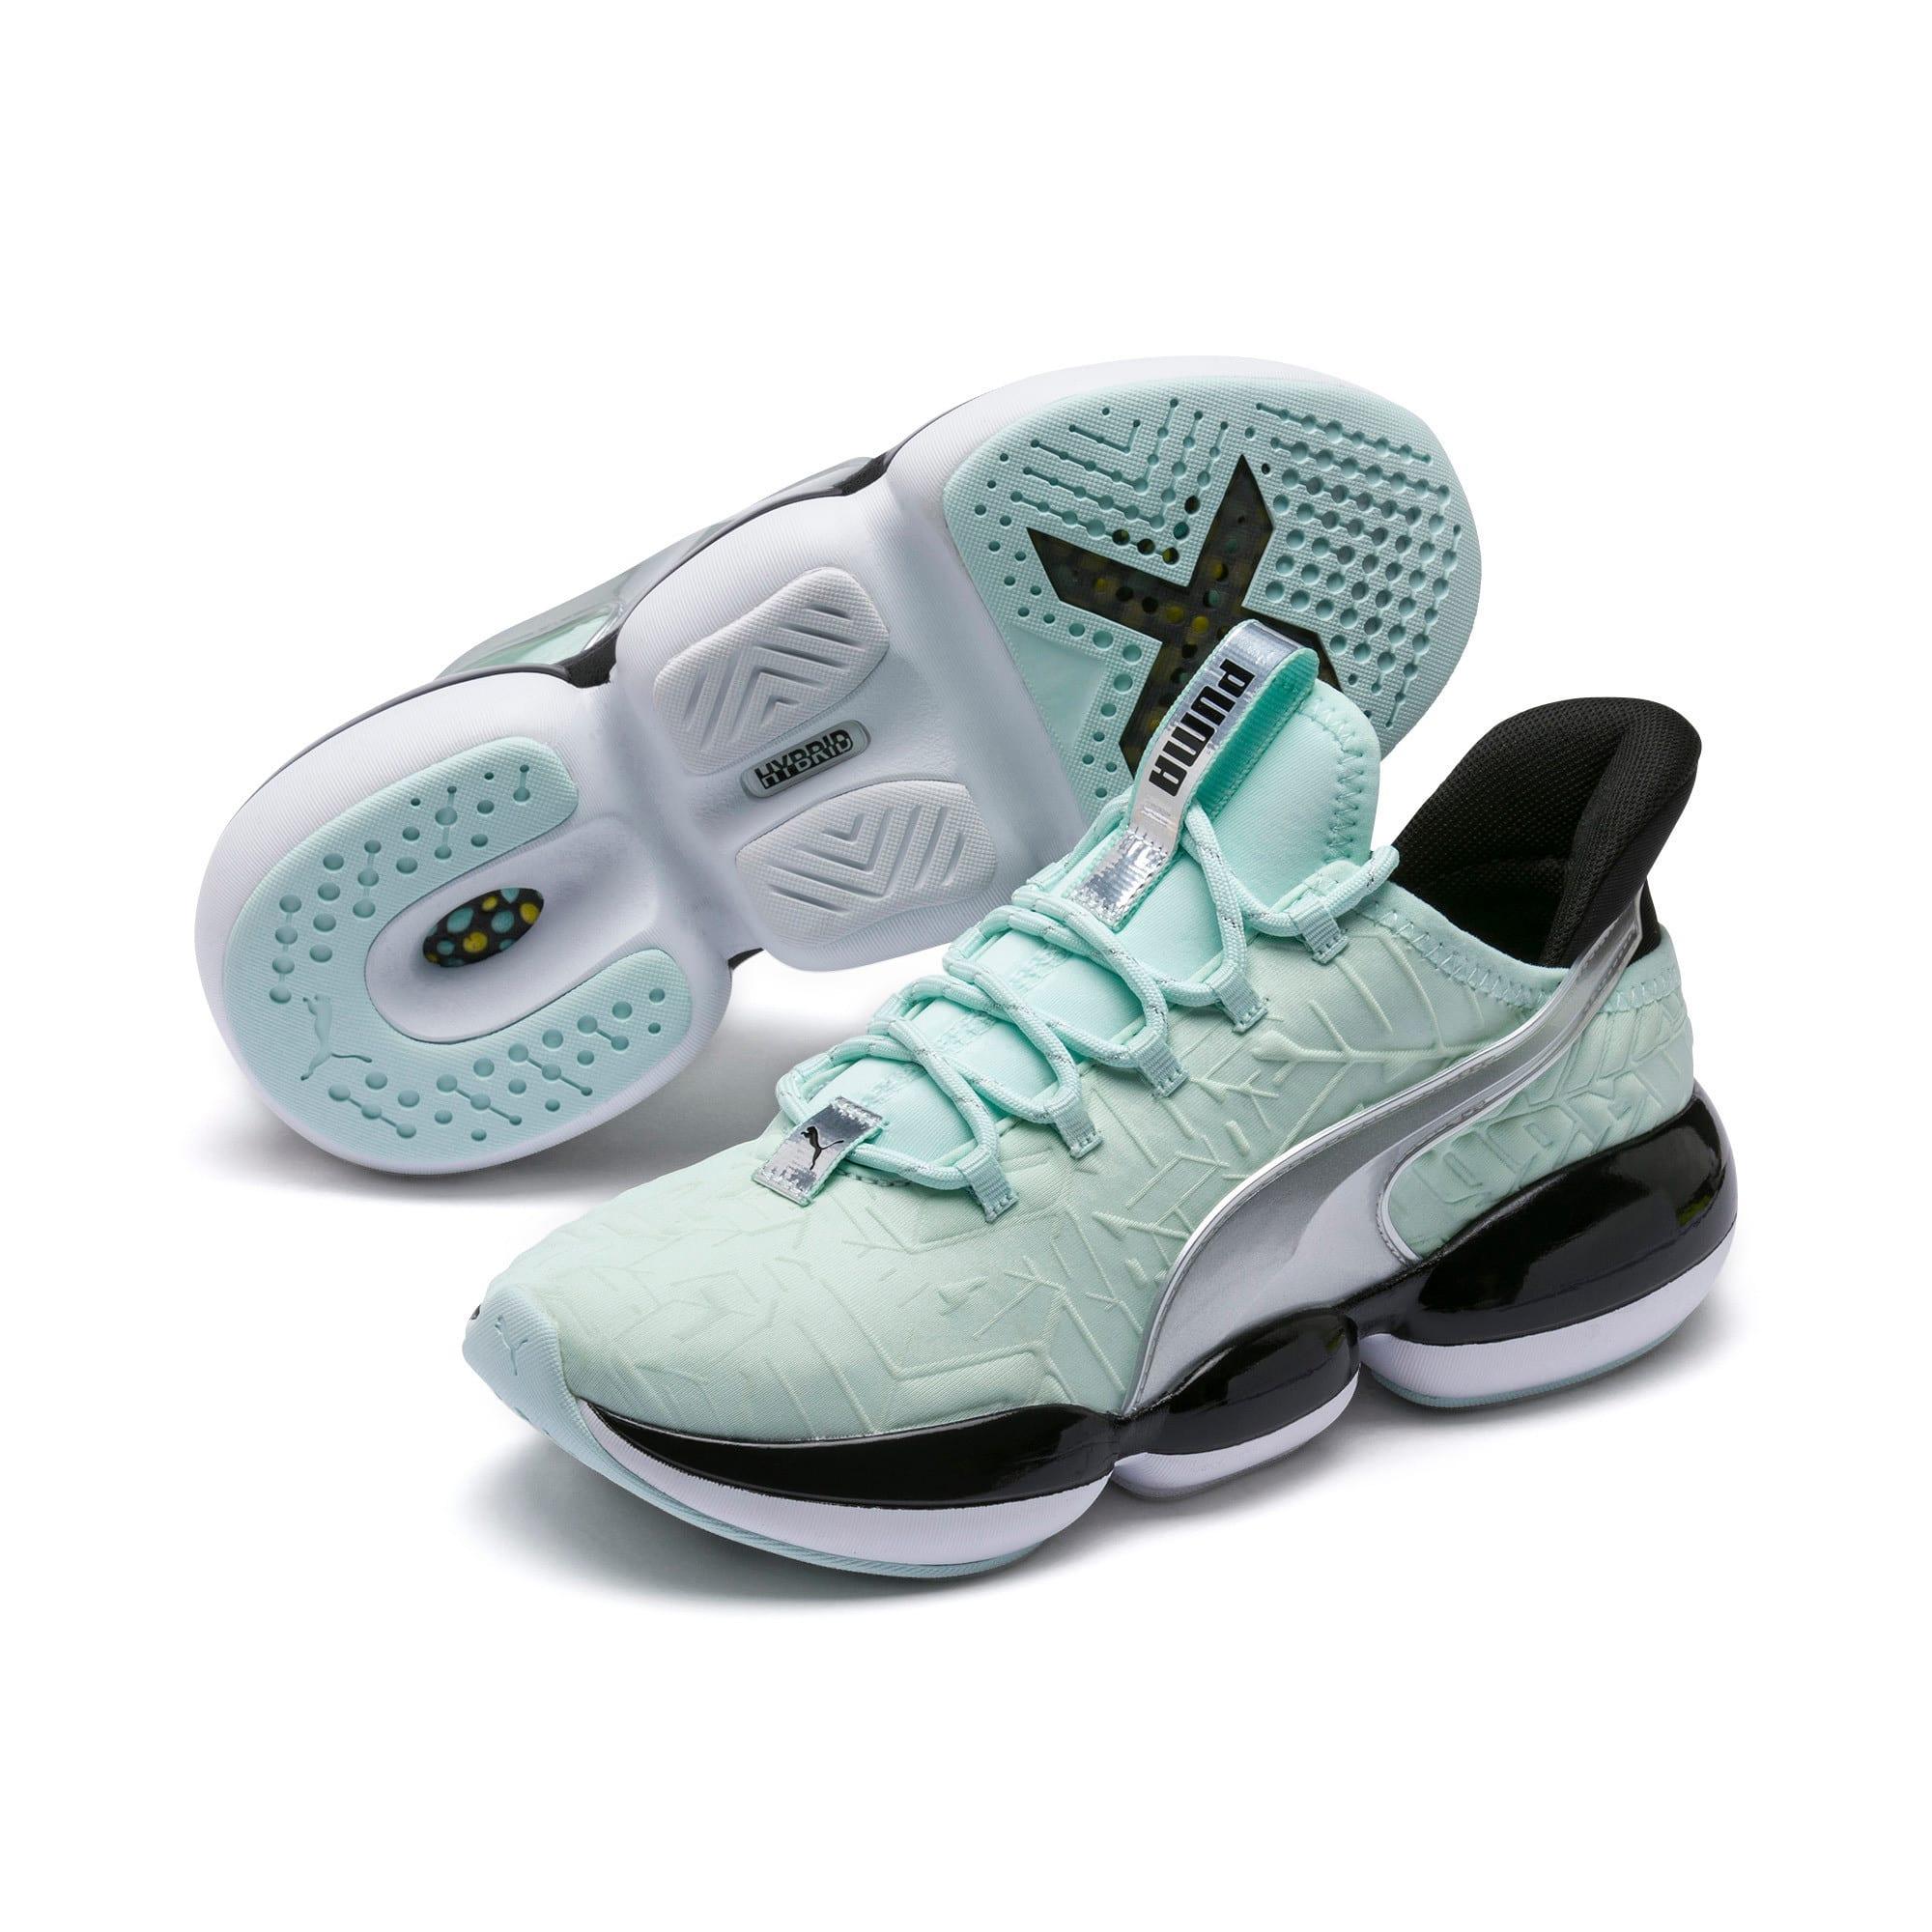 Thumbnail 3 of Mode XT Trailblazer Women's Training Shoes, Fair Aqua-Puma White, medium